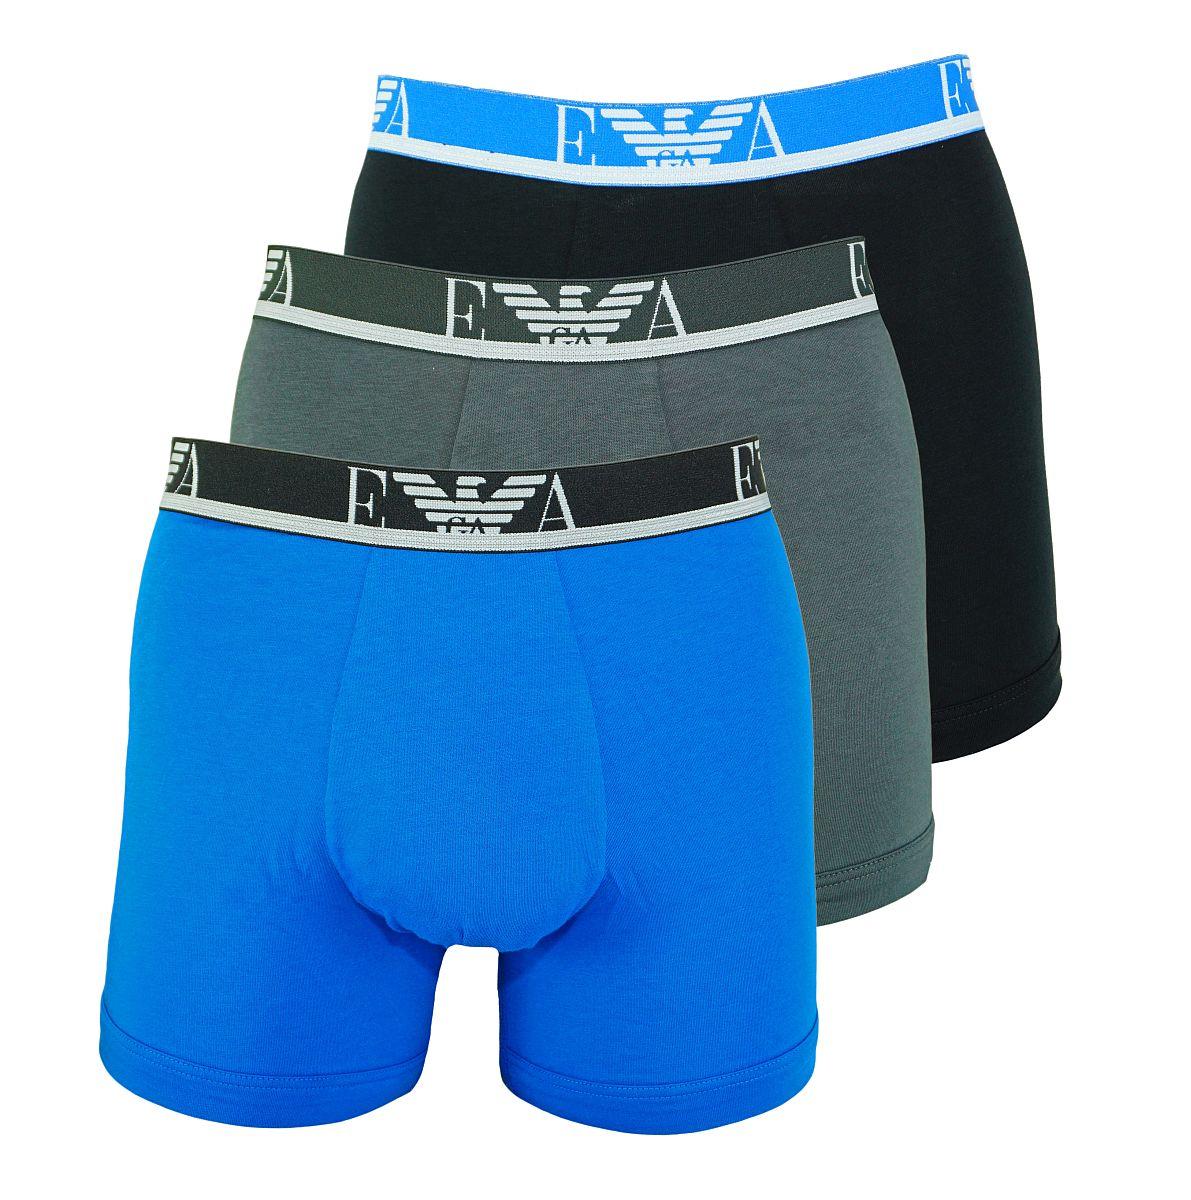 Emporio Armani 3er Pack Shorts Boxer Unterhose 111473 8P715 19944 ANTRAC/CIELO/NERO W18-EABZ1